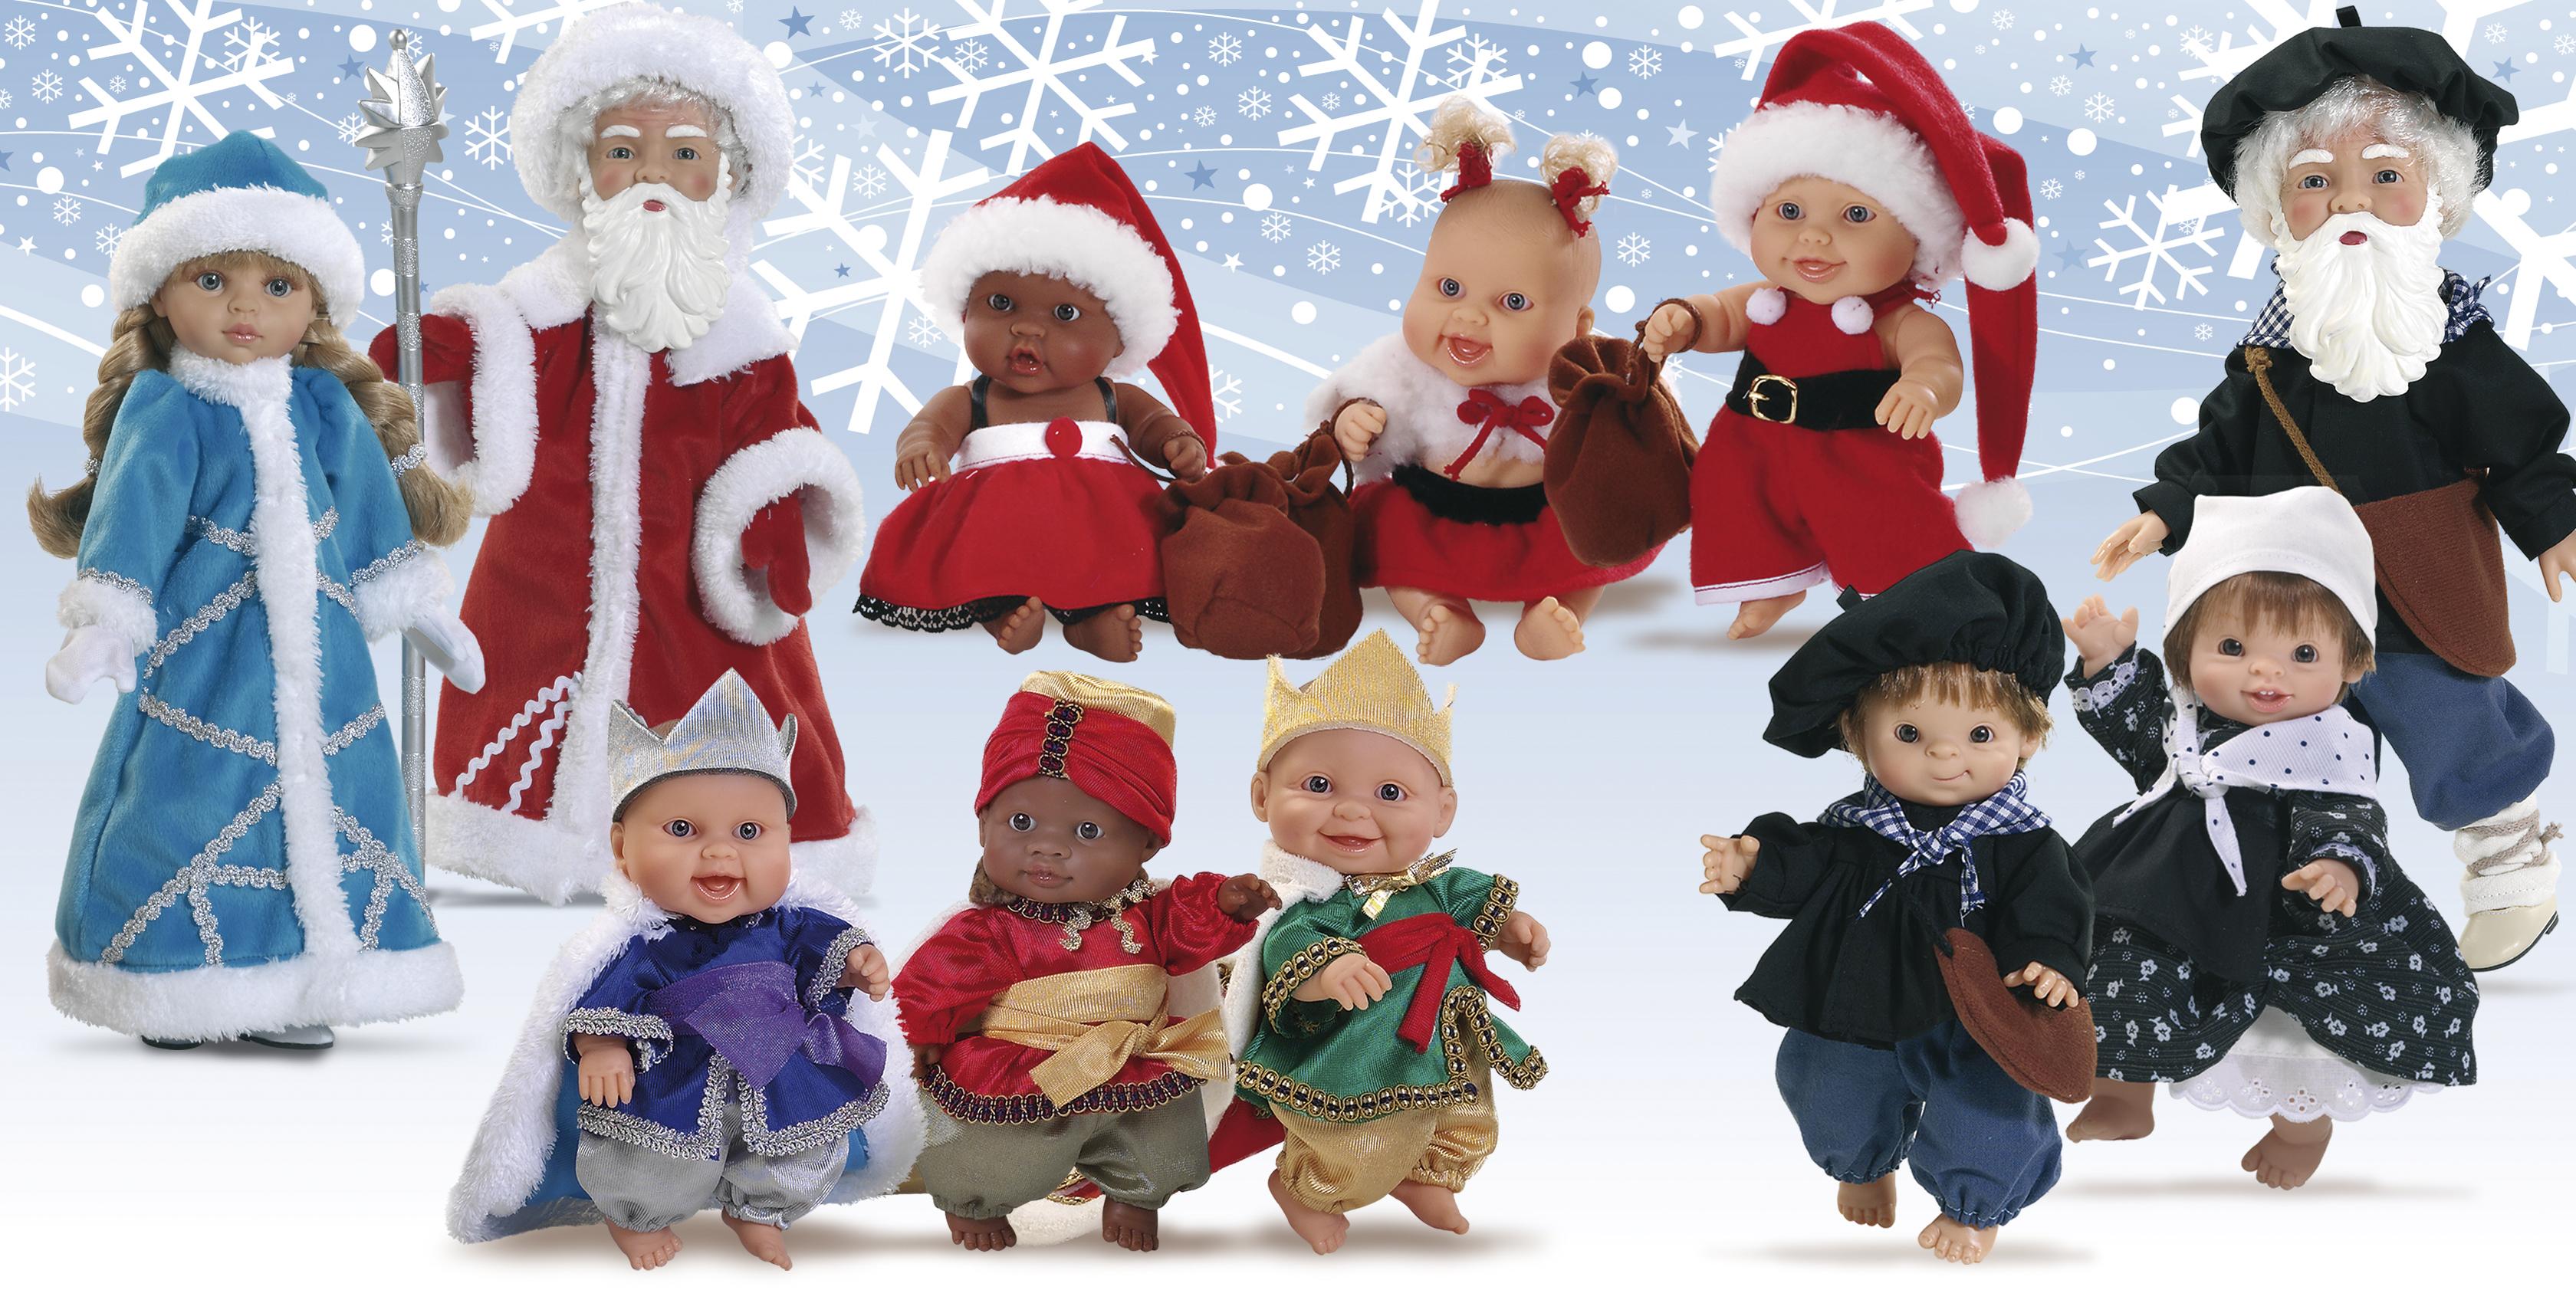 Munecas_Paola_Reina_Muñecos_Navidad